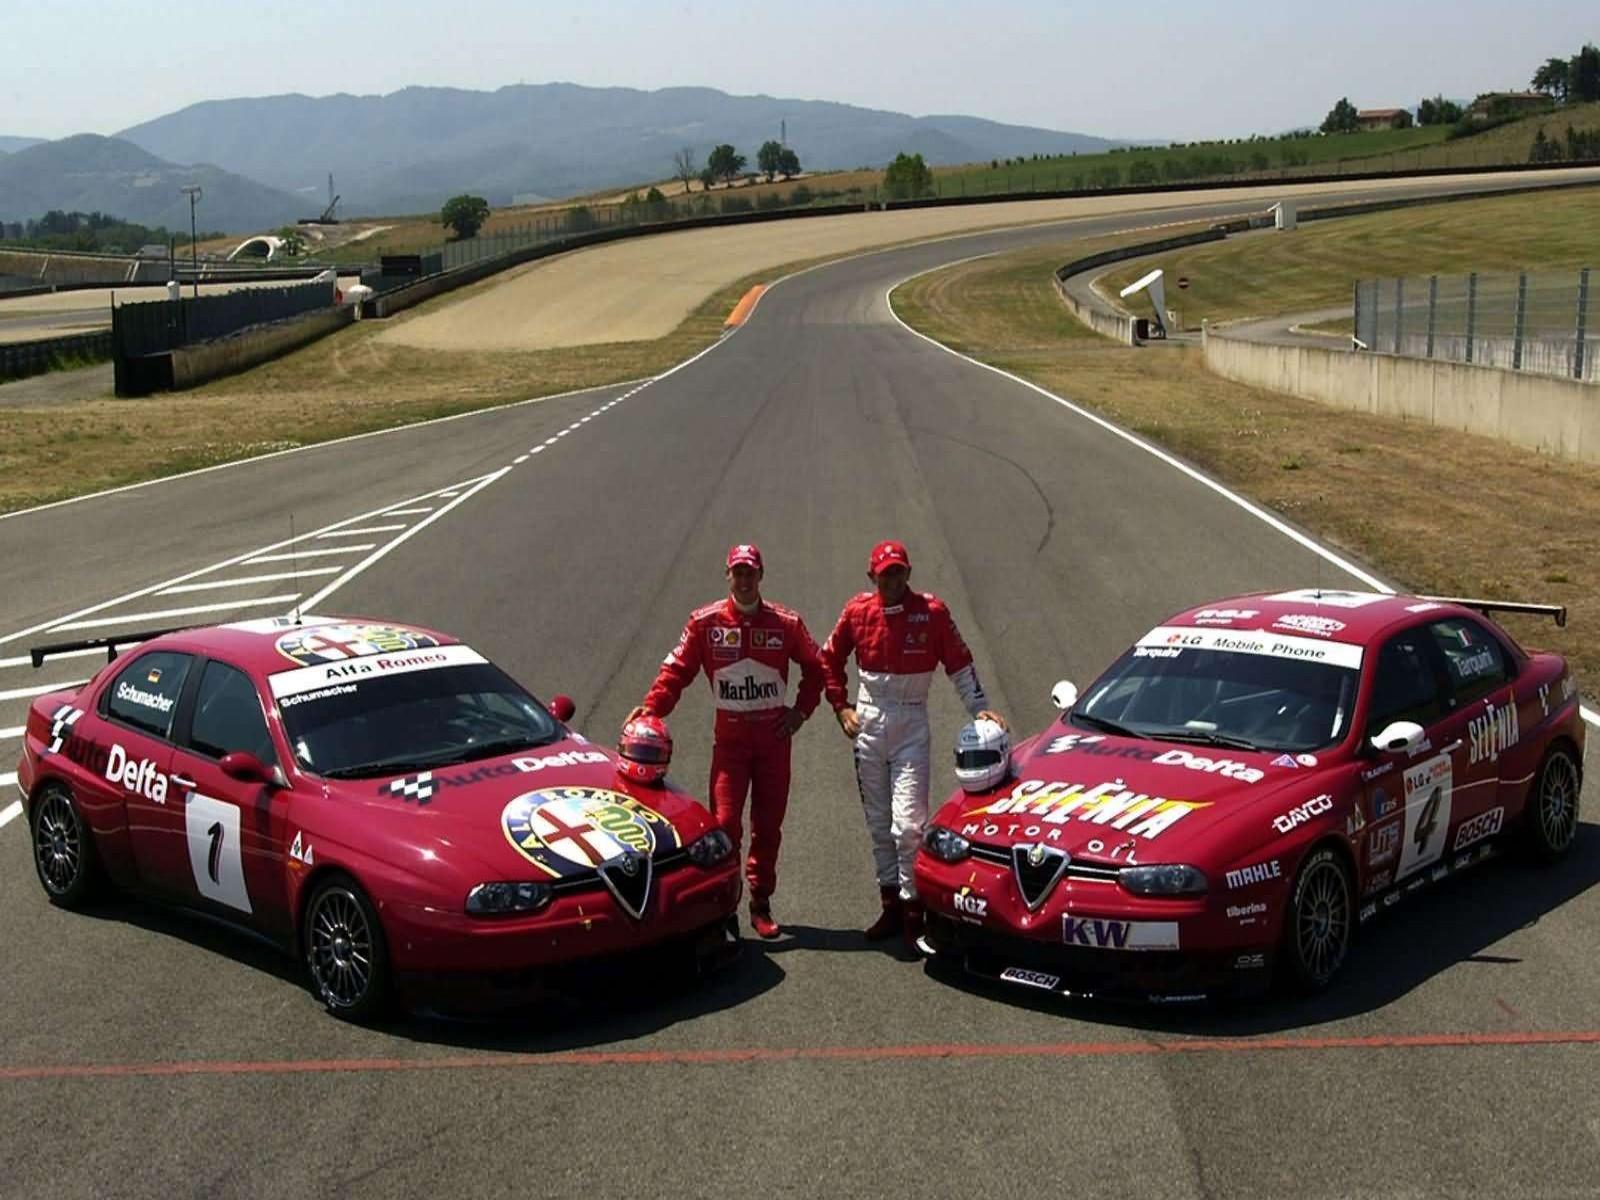 Alfa Romeo 156 Gta Autodelta 2003